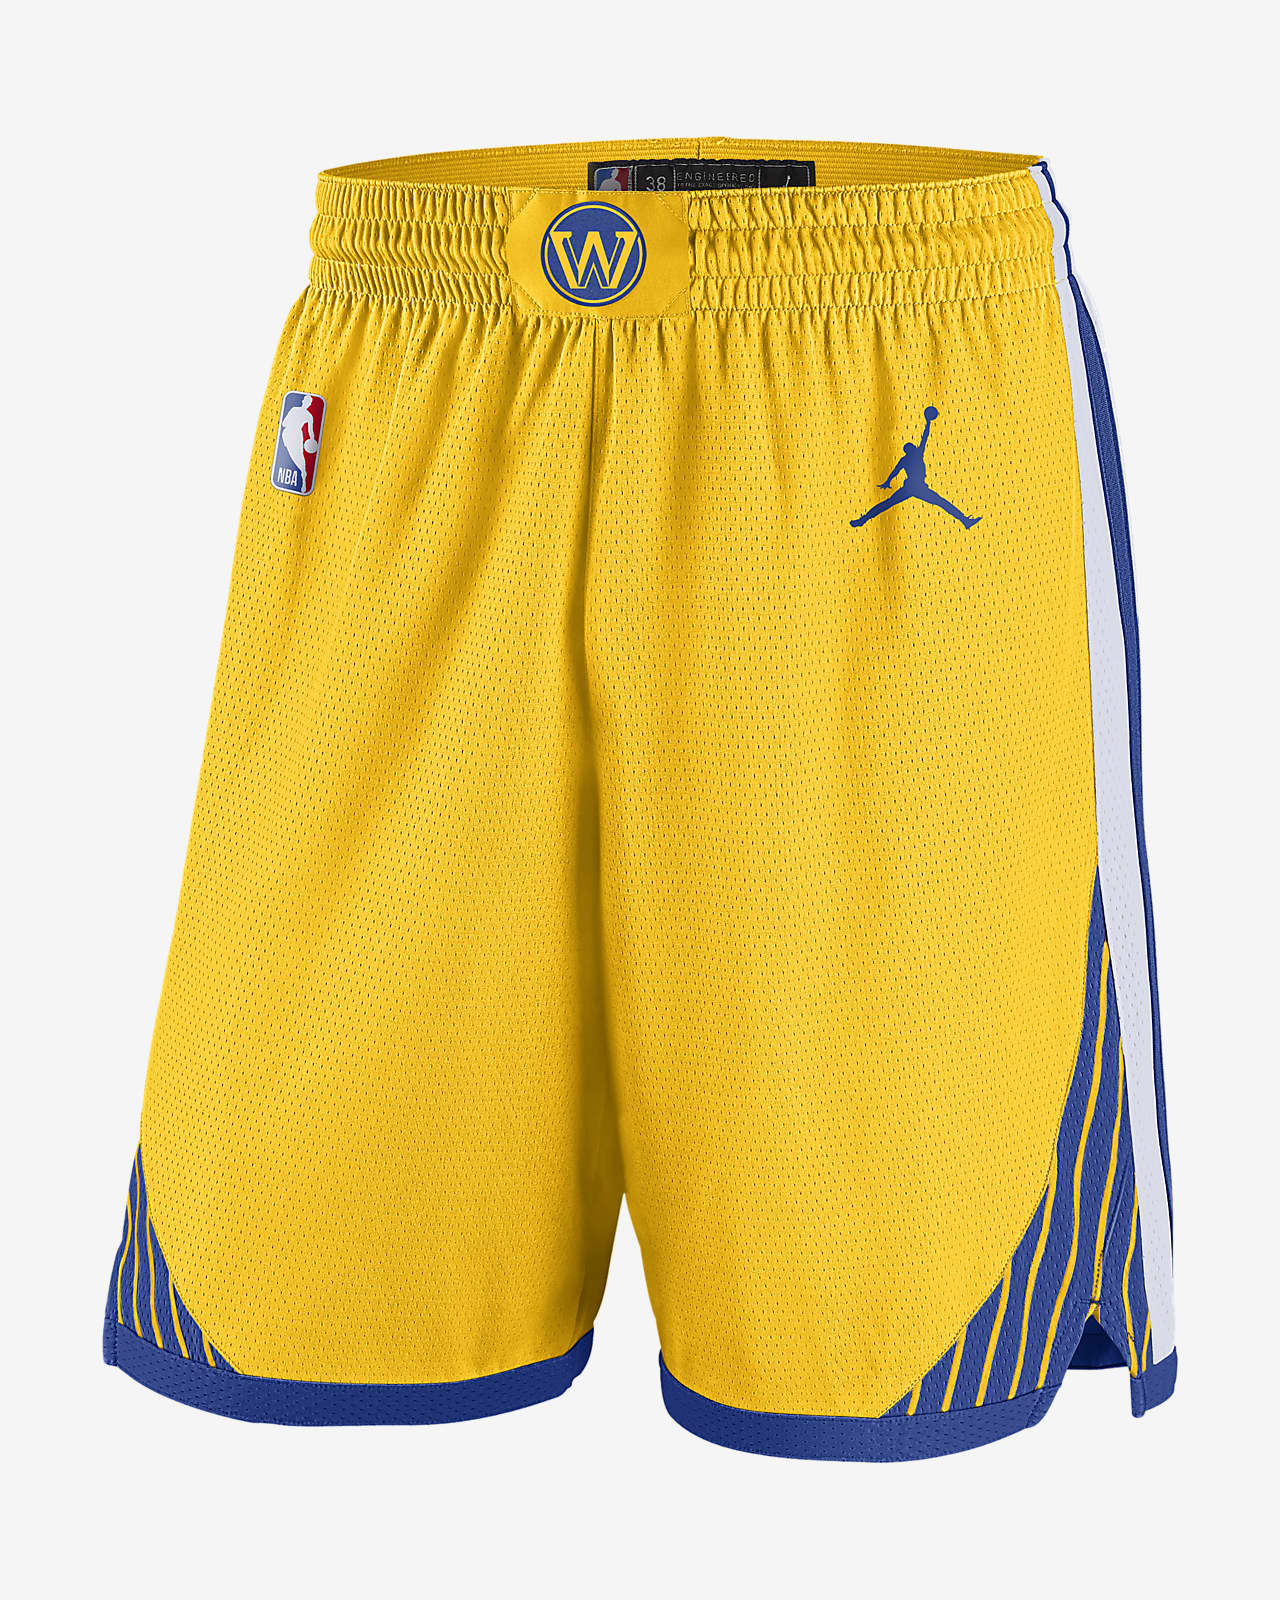 Warriors Statement Edition 2020 Men's Jordan NBA Swingman Shorts